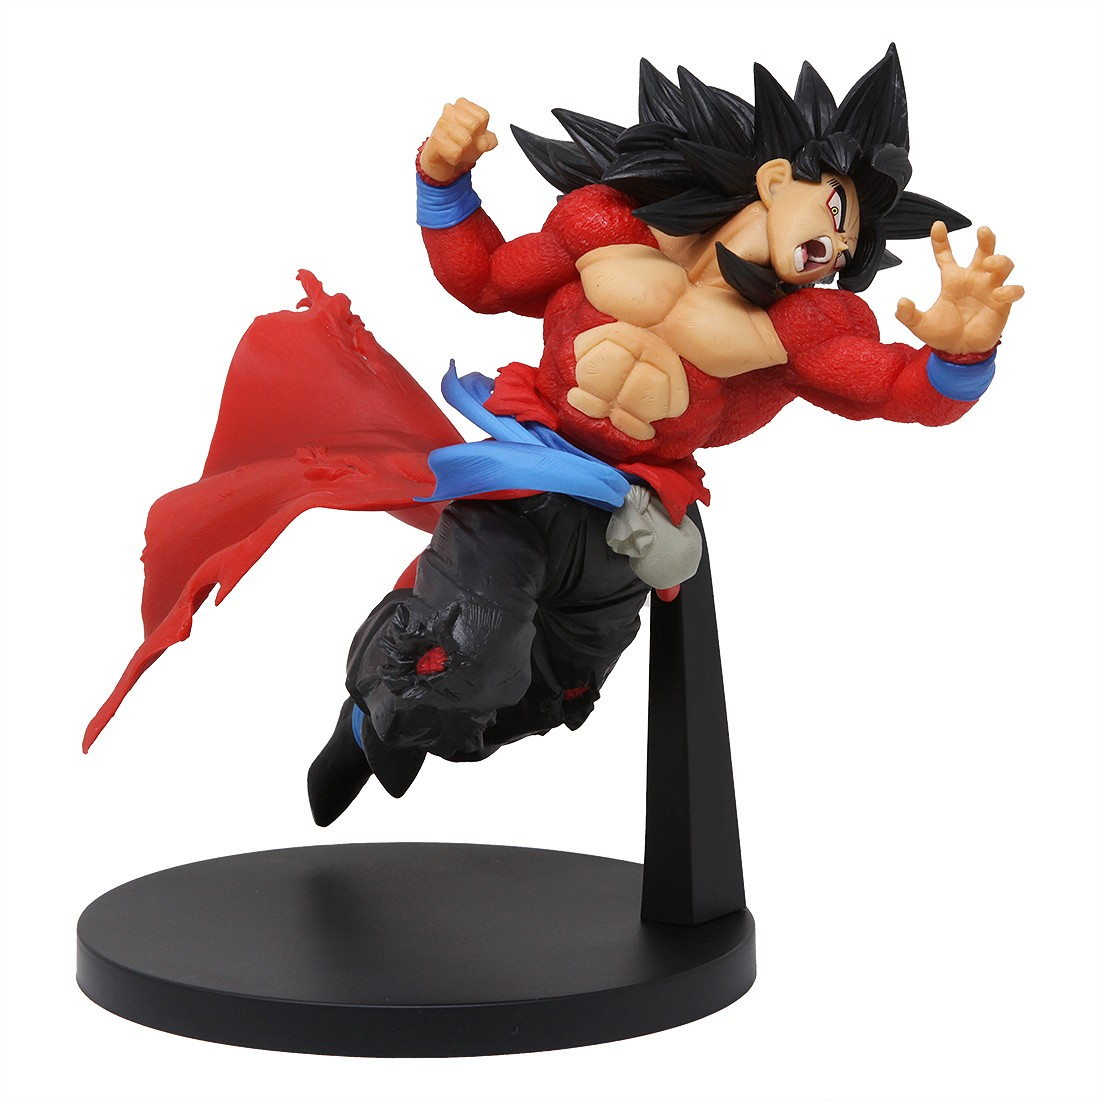 Banpresto Super Dragon ball Heroes 9th Anniv SS4 Gokou Xeno Figure Japan F//S